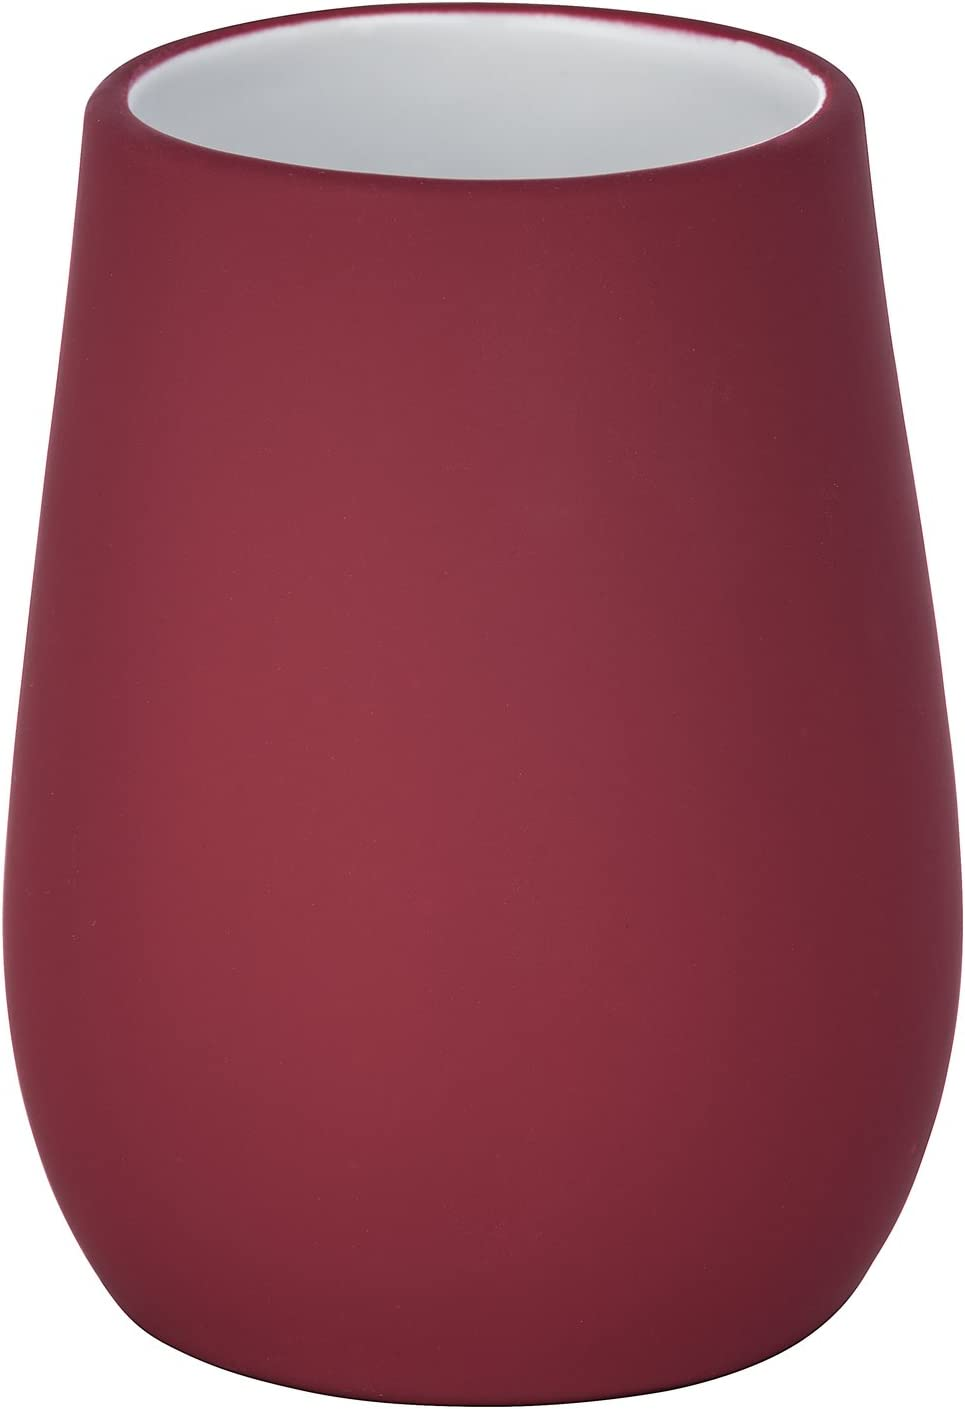 9 x 8.5 x 17 cm 8 x 10,5 x 8 cm Rot Porta spazzolini in Ceramica Wenko 23269100 Sydney Ceramica